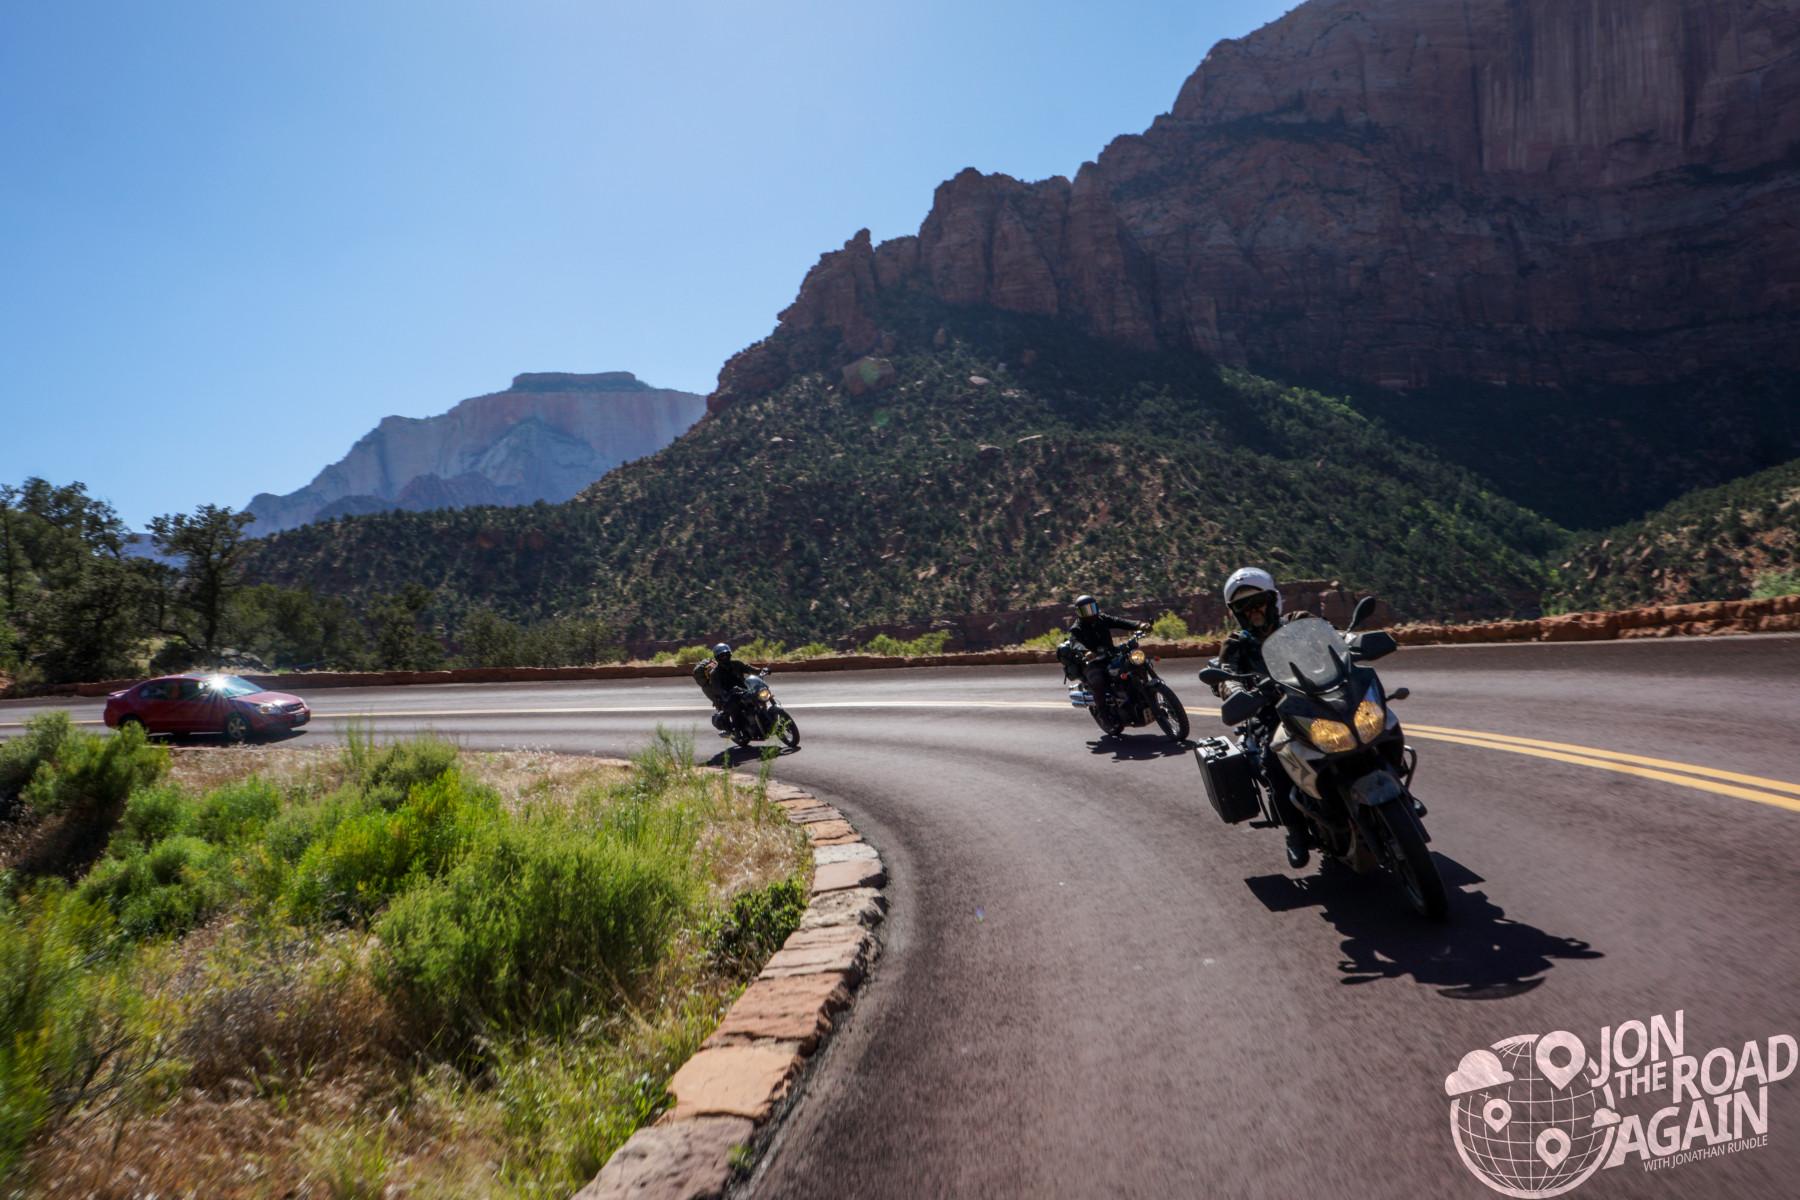 Riding Zion National Park